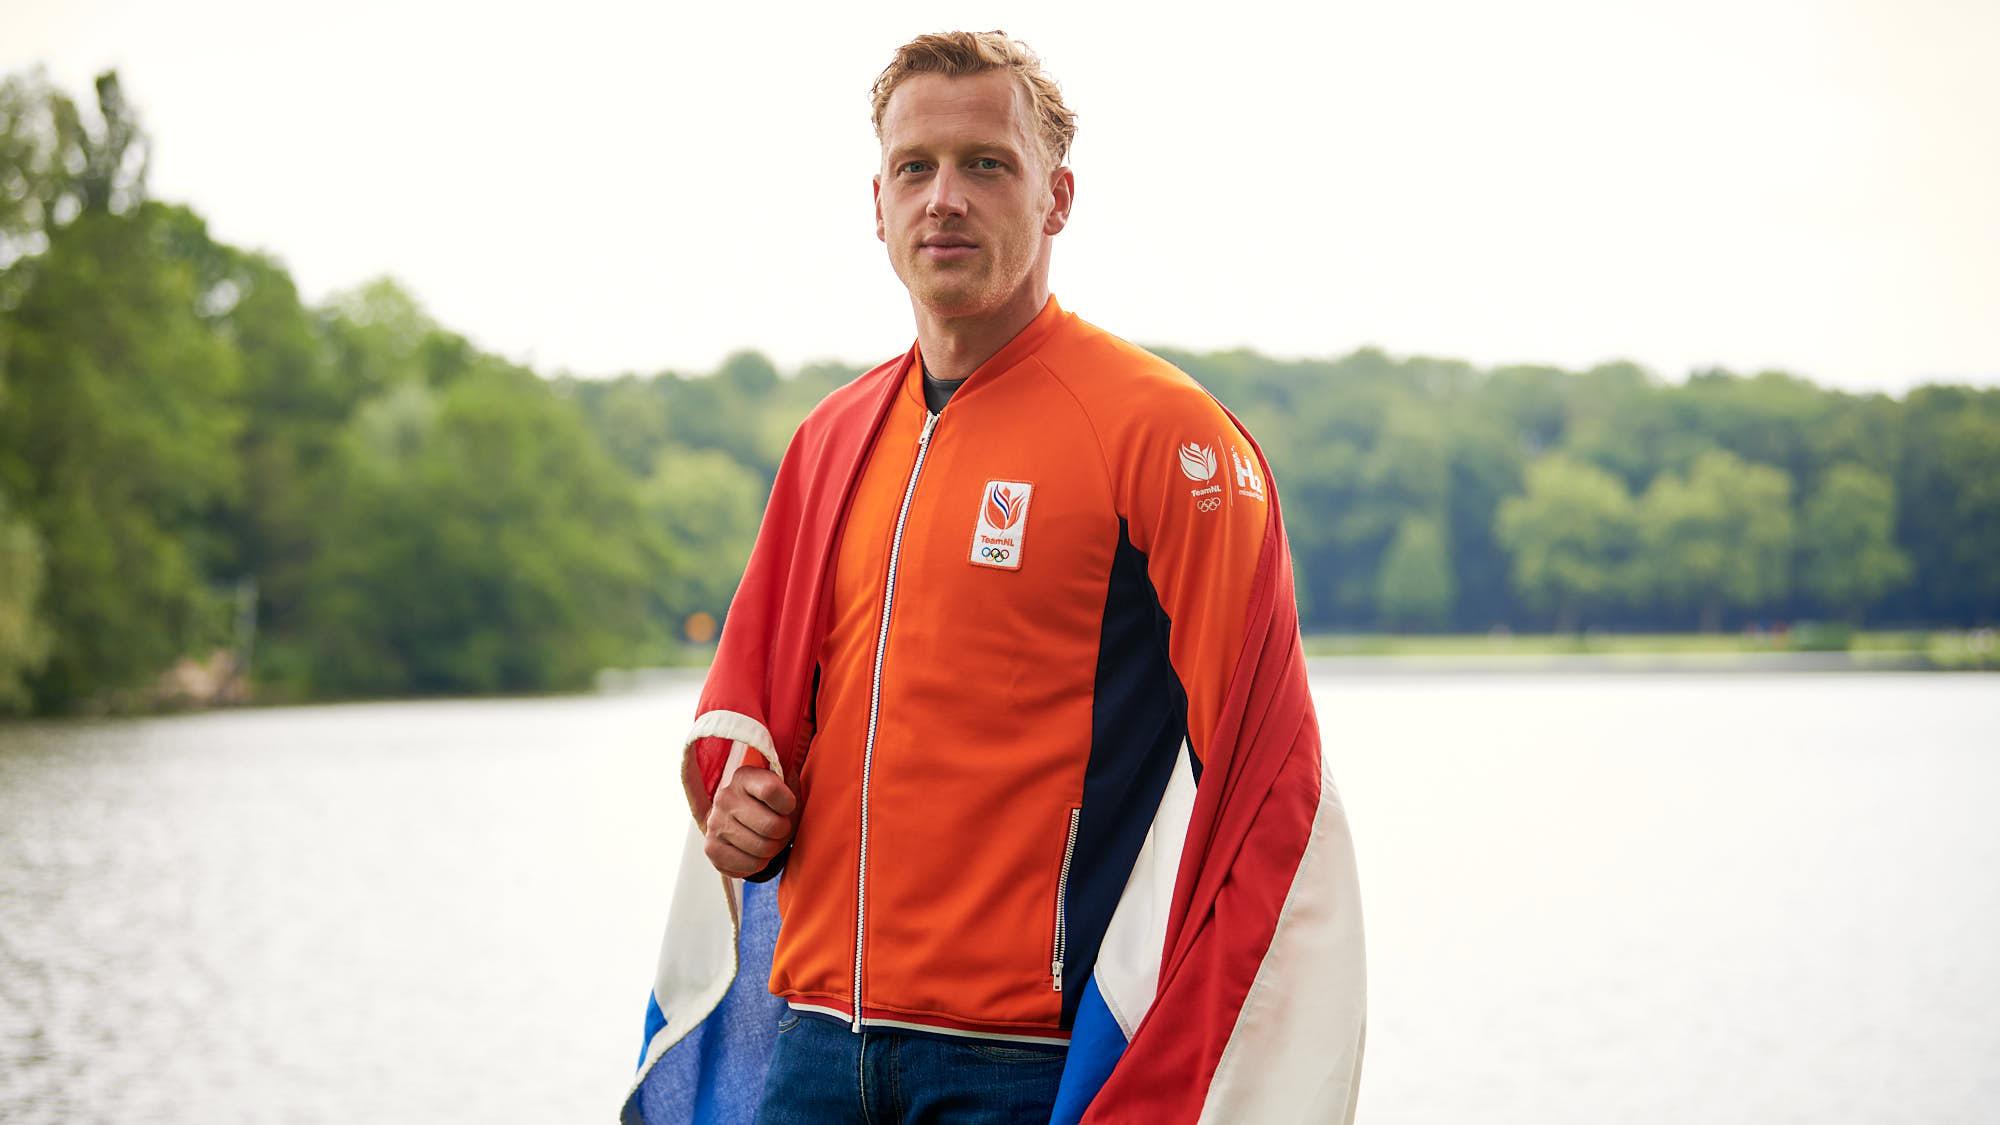 Ferry Weertman wearing TeamNL vest and Dutch flag